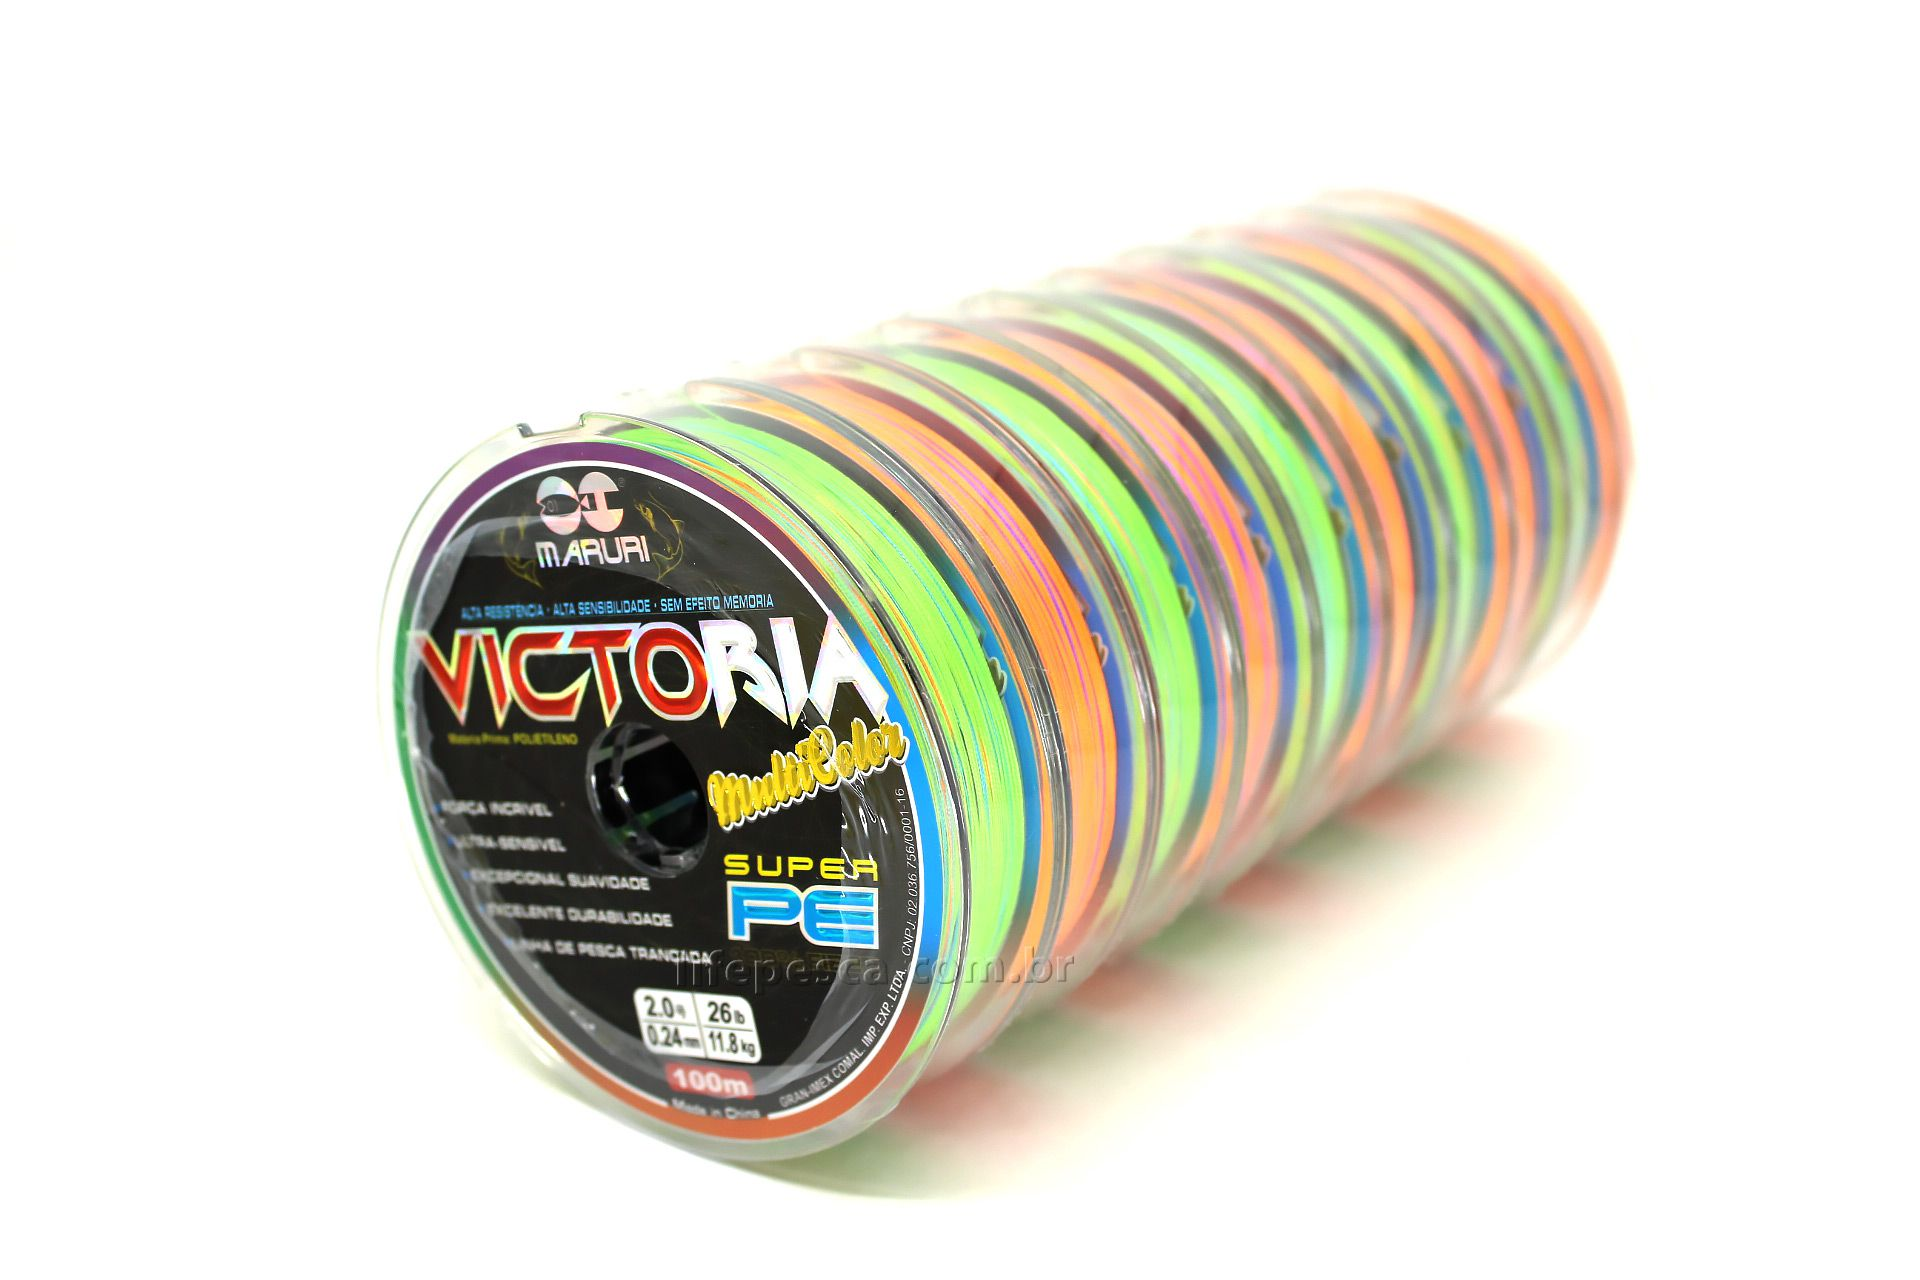 Linha Multifilamento Maruri Victoria 8x Colorida 0,50mm 76lb/34,5kg - 100 Metros